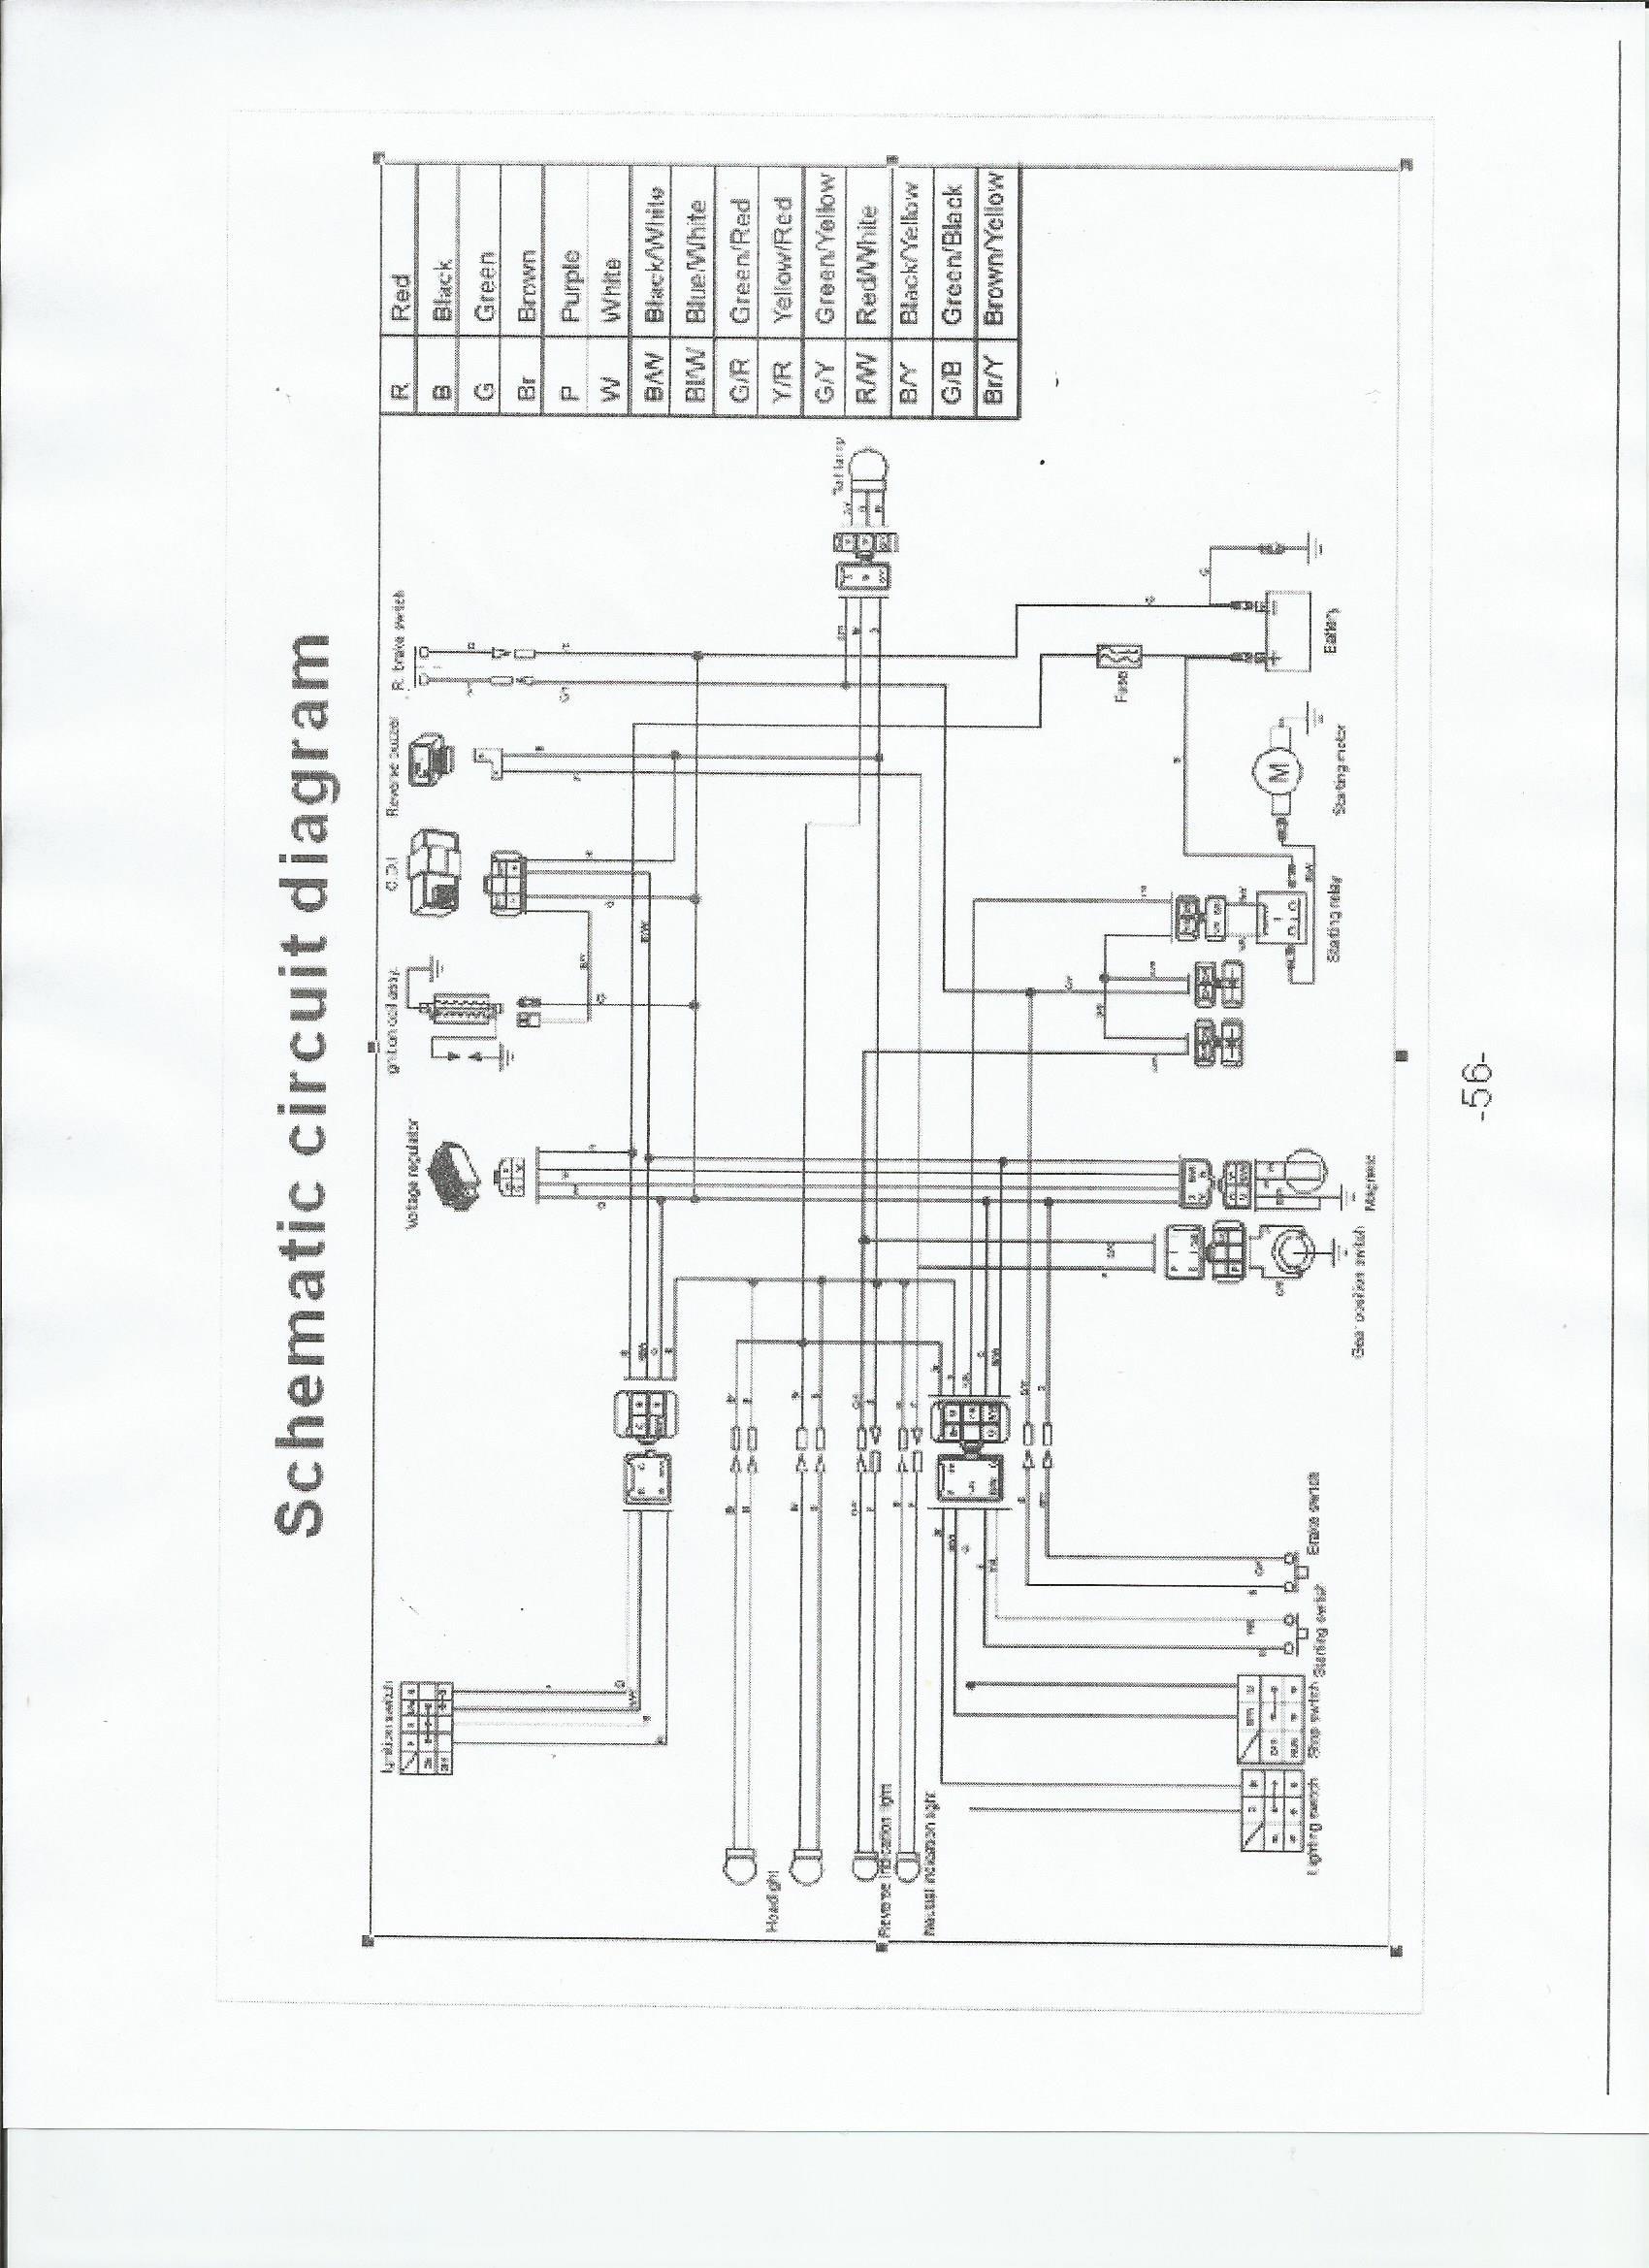 Diagrams In Addition Honda 50 Wiring Diagram Besides Honda Ruckus